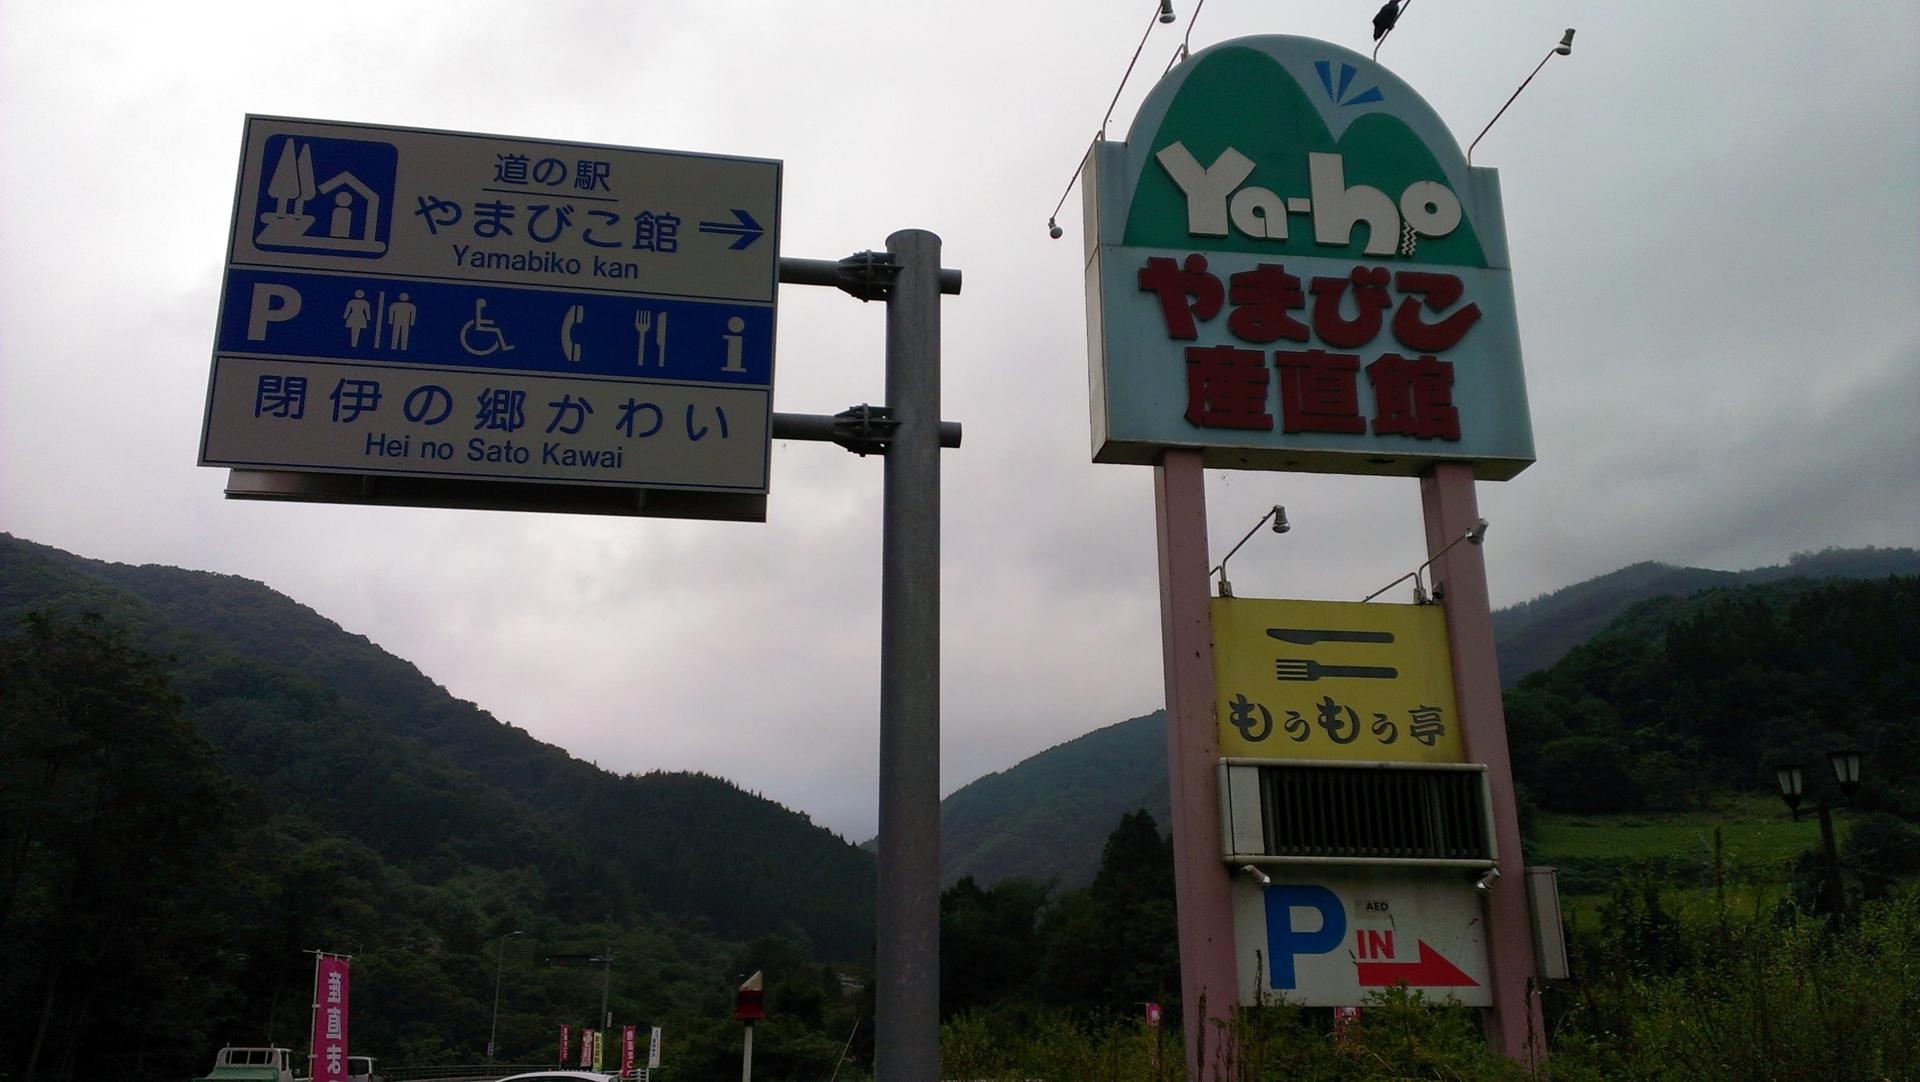 f:id:ToshUeno:20130913154748j:plain